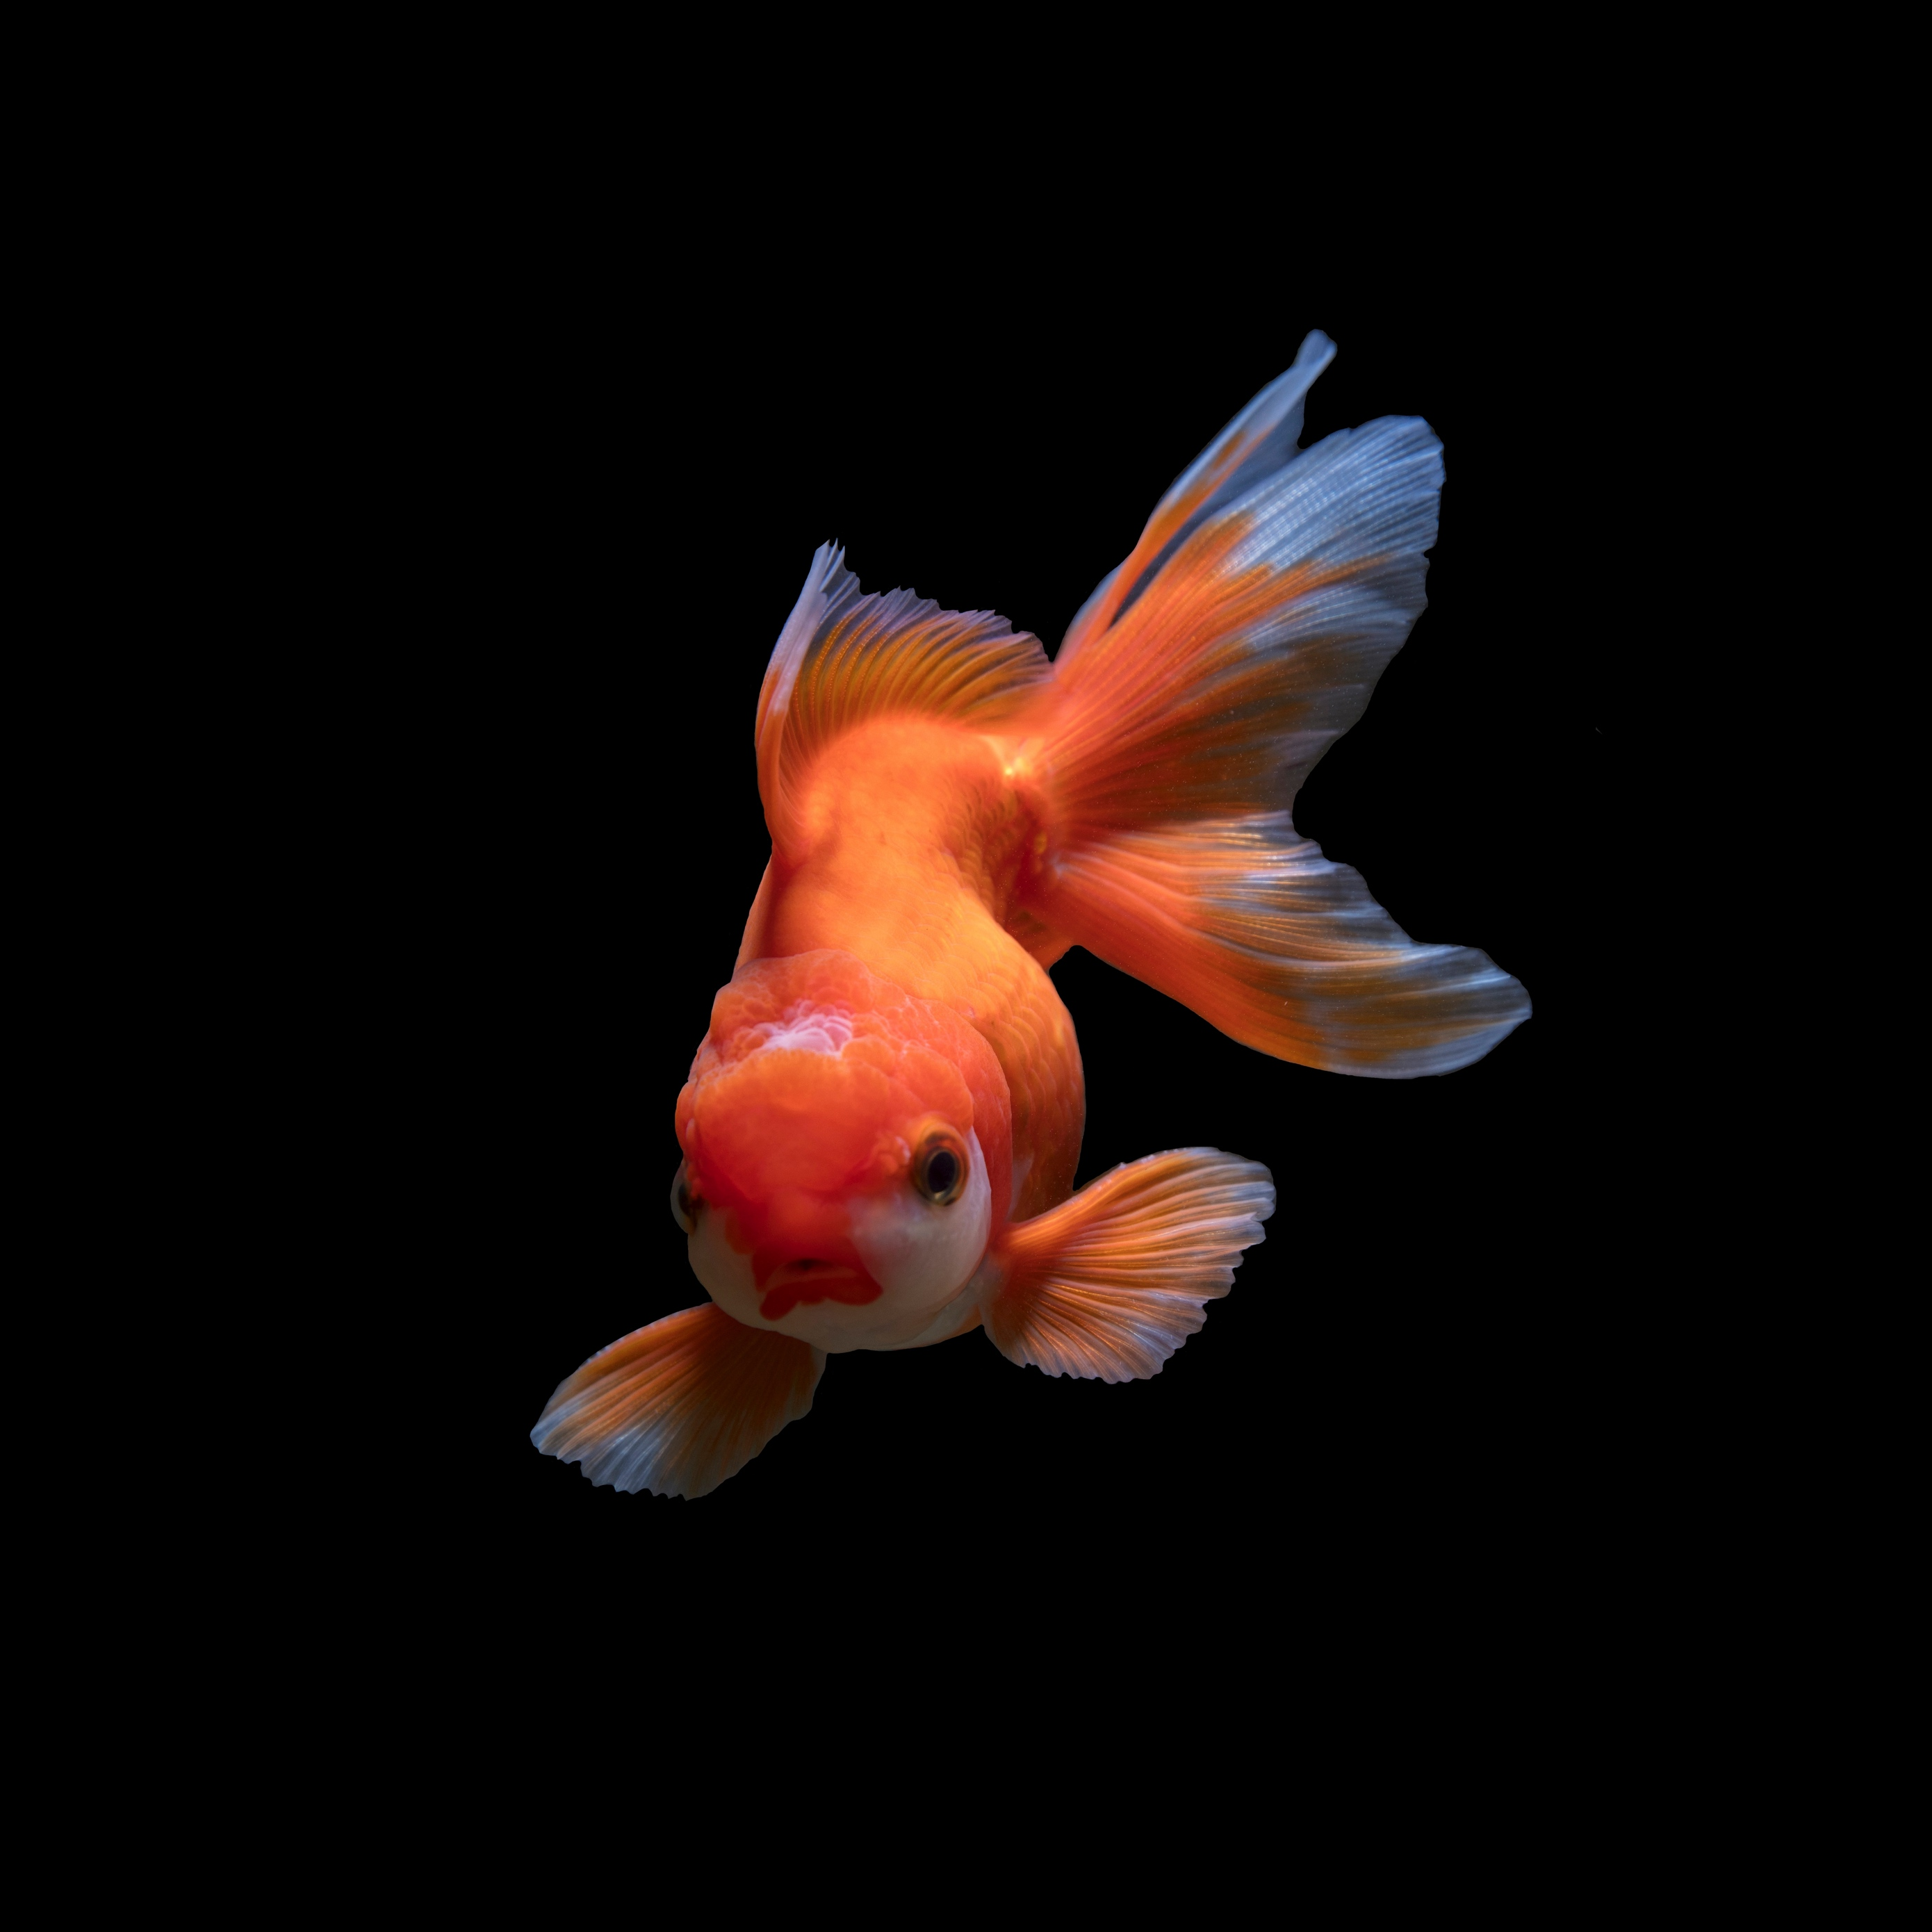 Download wallpaper 2780x2780 fish underwater world swim orange 2780x2780